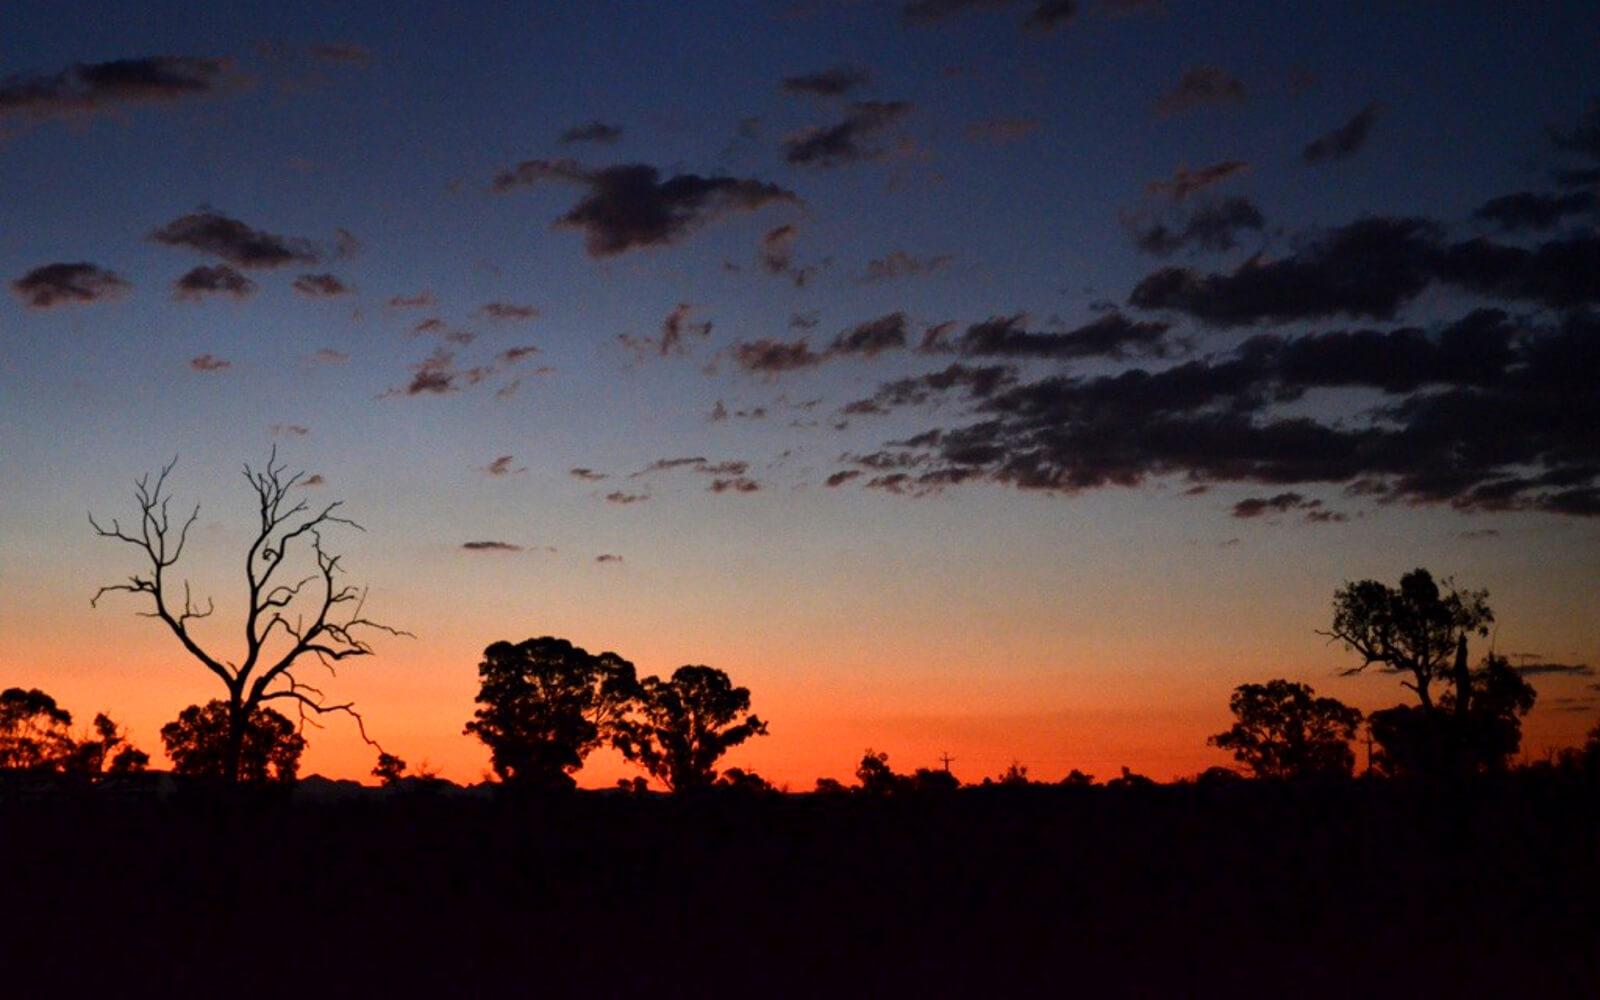 Das Outback bei Nacht